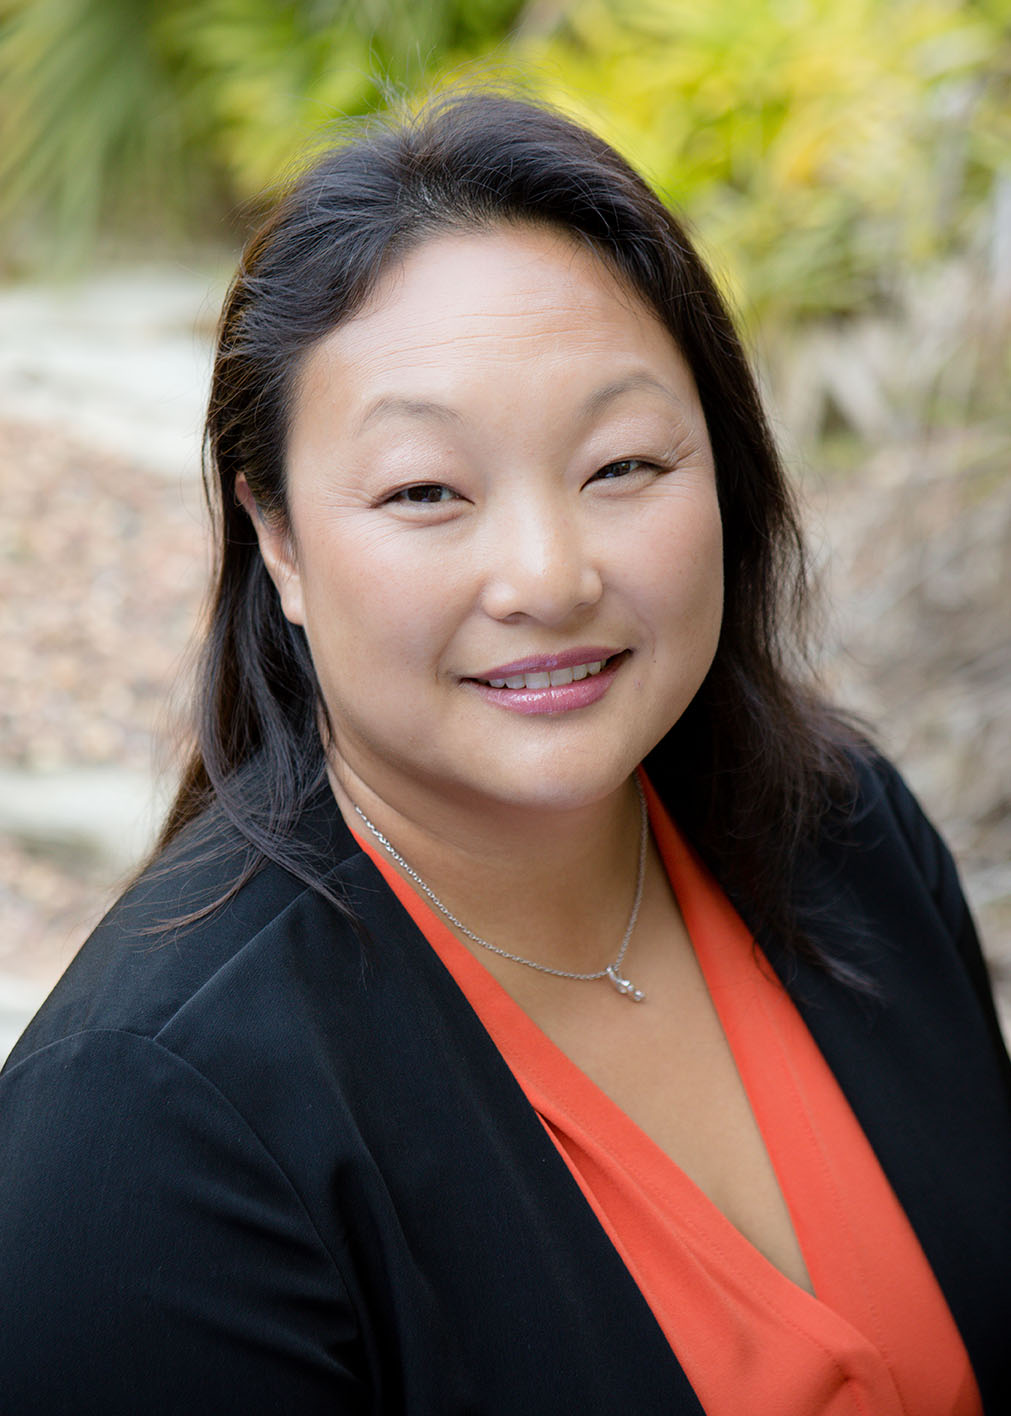 Tanya Nash, Asphalt Testing Solutions & Engineering Pavement Materials Engineer